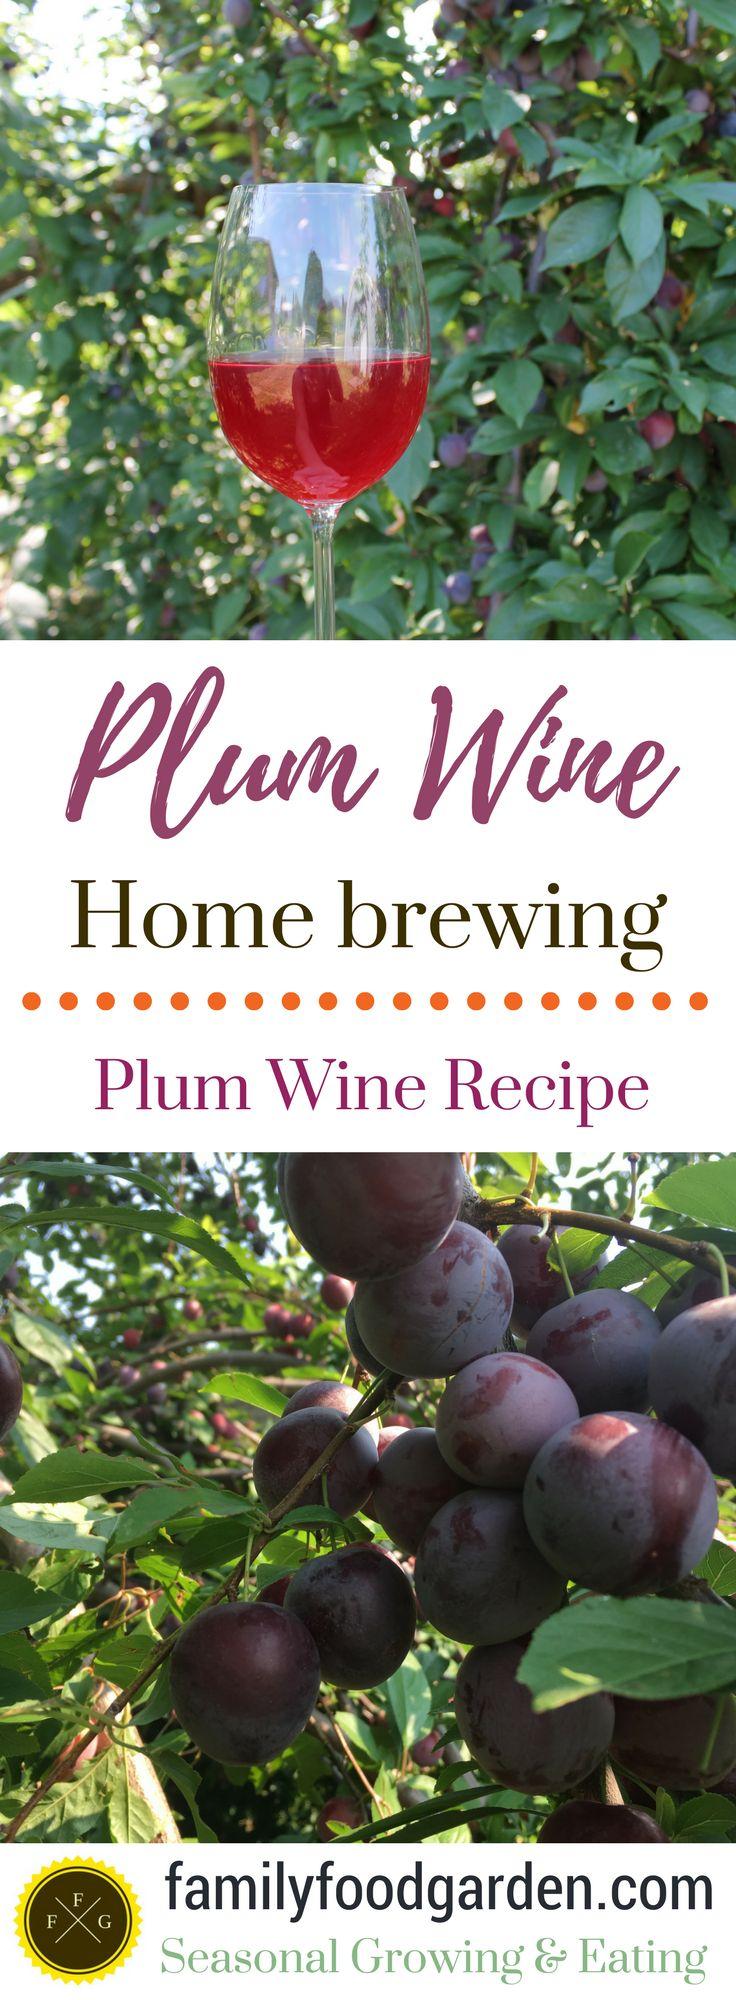 How to make plum wine